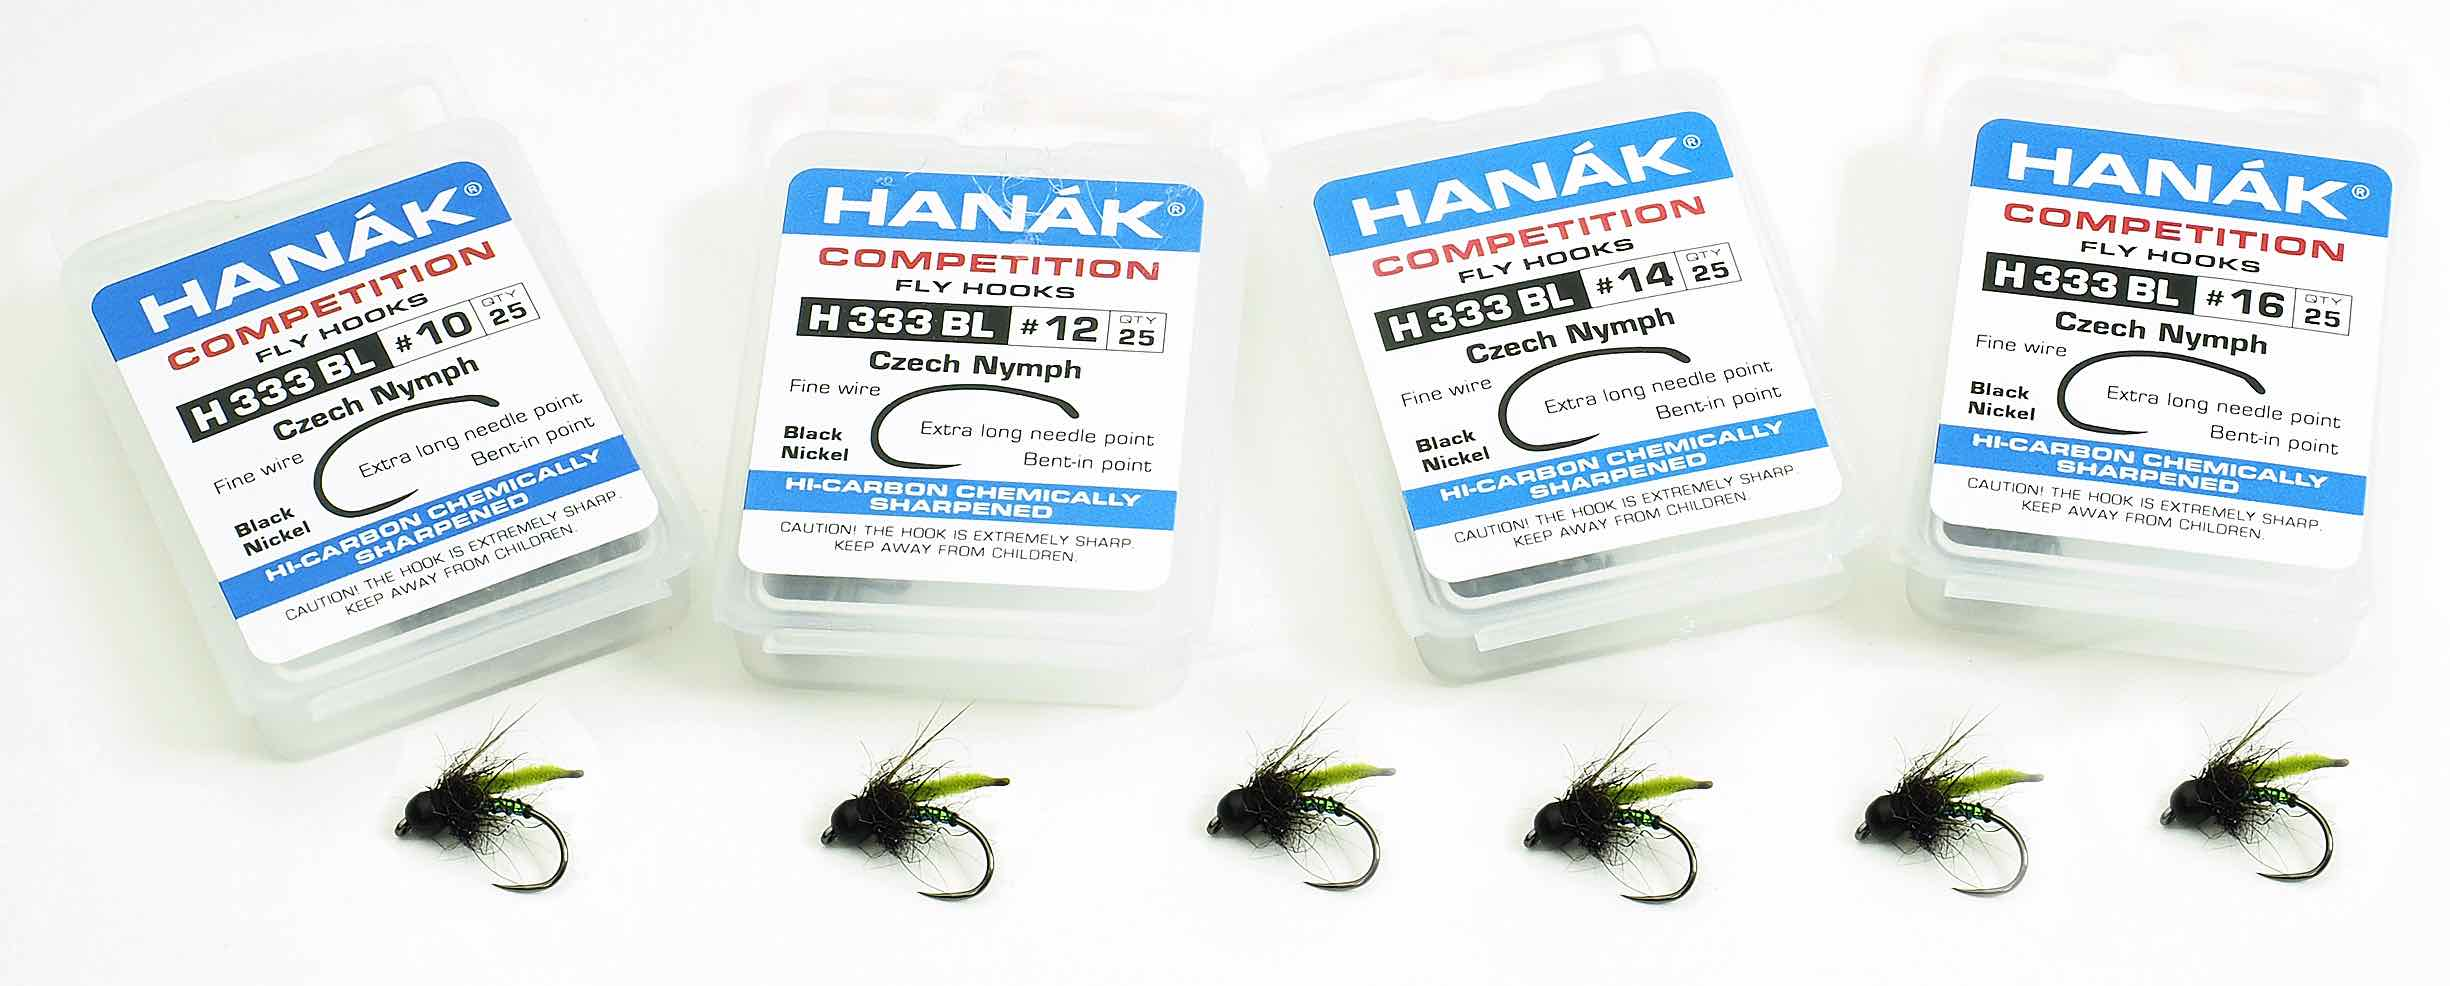 Hanak Competition H333BL Czech Nymph Barbless Hook